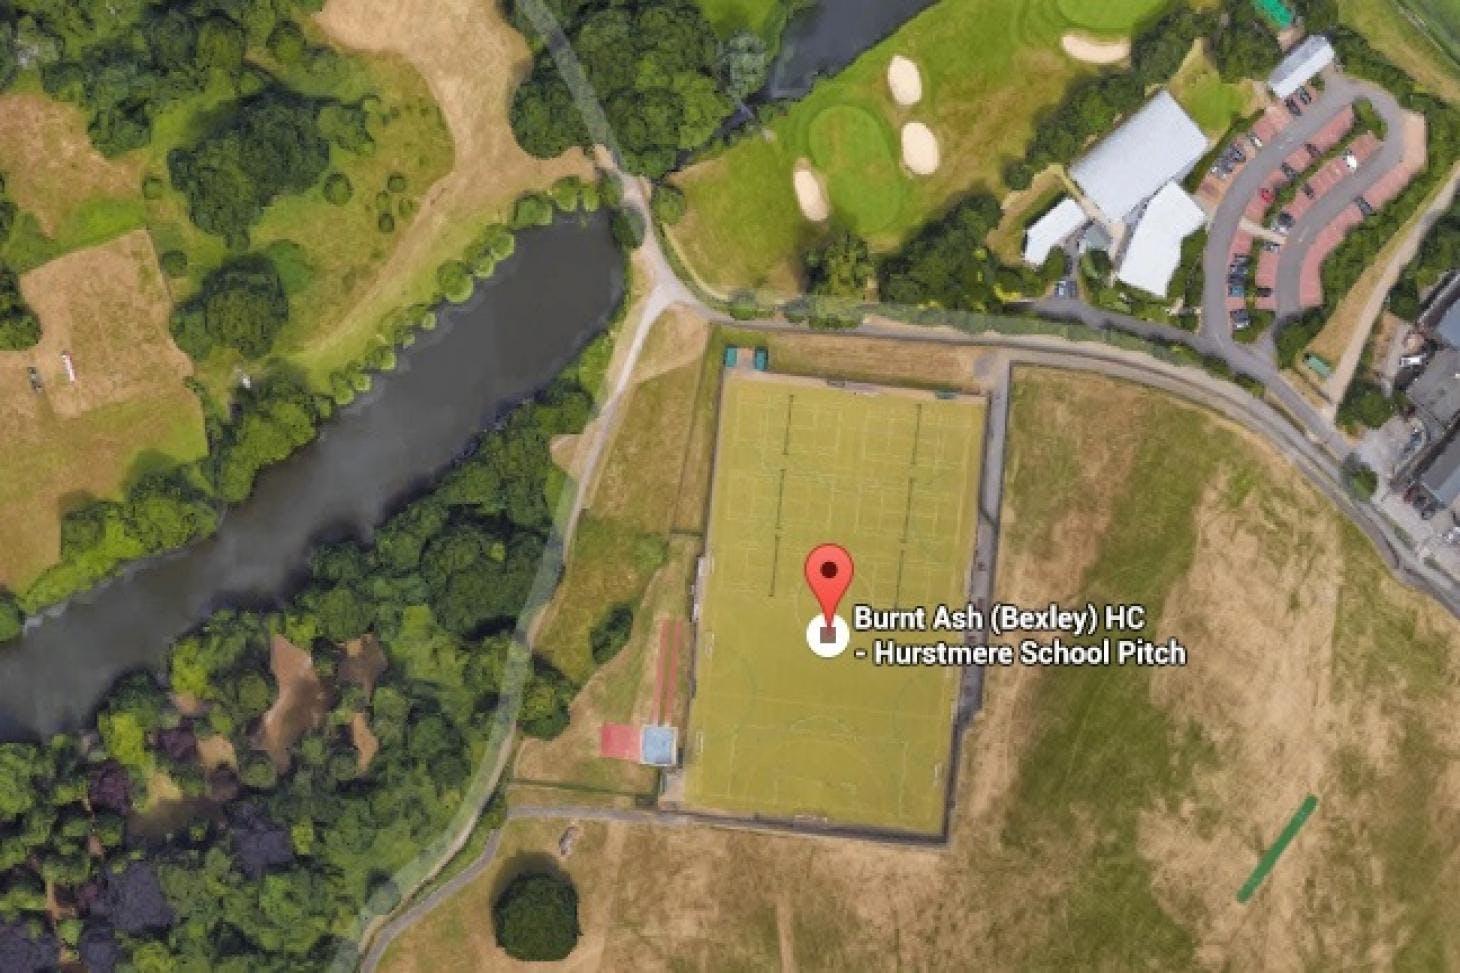 Burnt Ash Hockey Club, Hurstmere School Pitch Outdoor | Astroturf hockey pitch